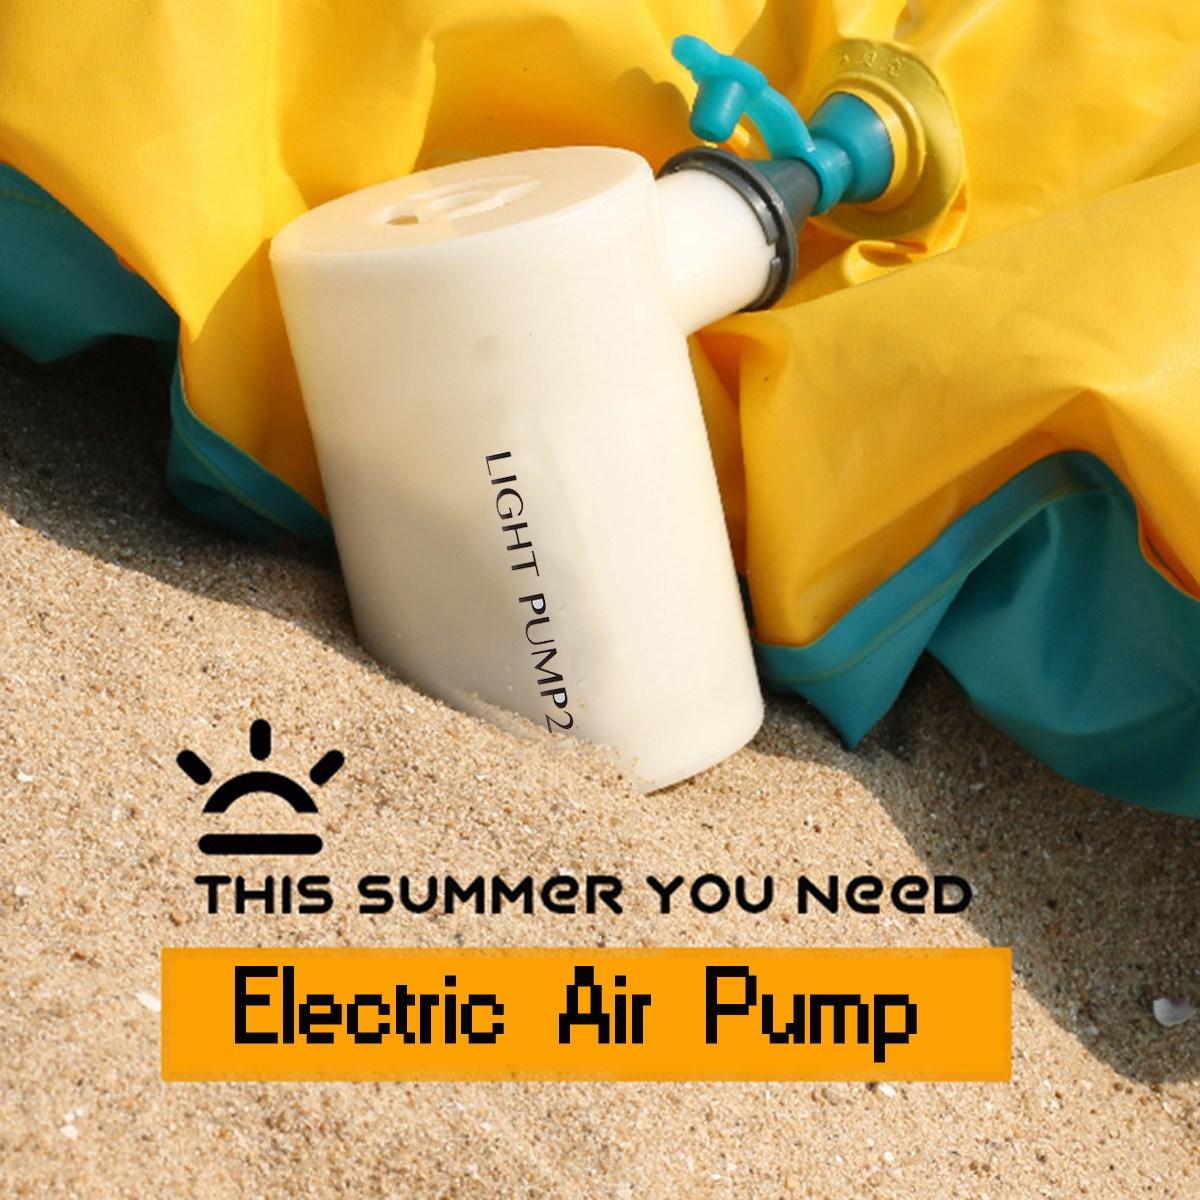 USB Electric Air Pump Outdoor Camping Inflate Deflate Pump Mini Ultralight Portable Swimming Pool Air Bed Mattress Boat Air Pump